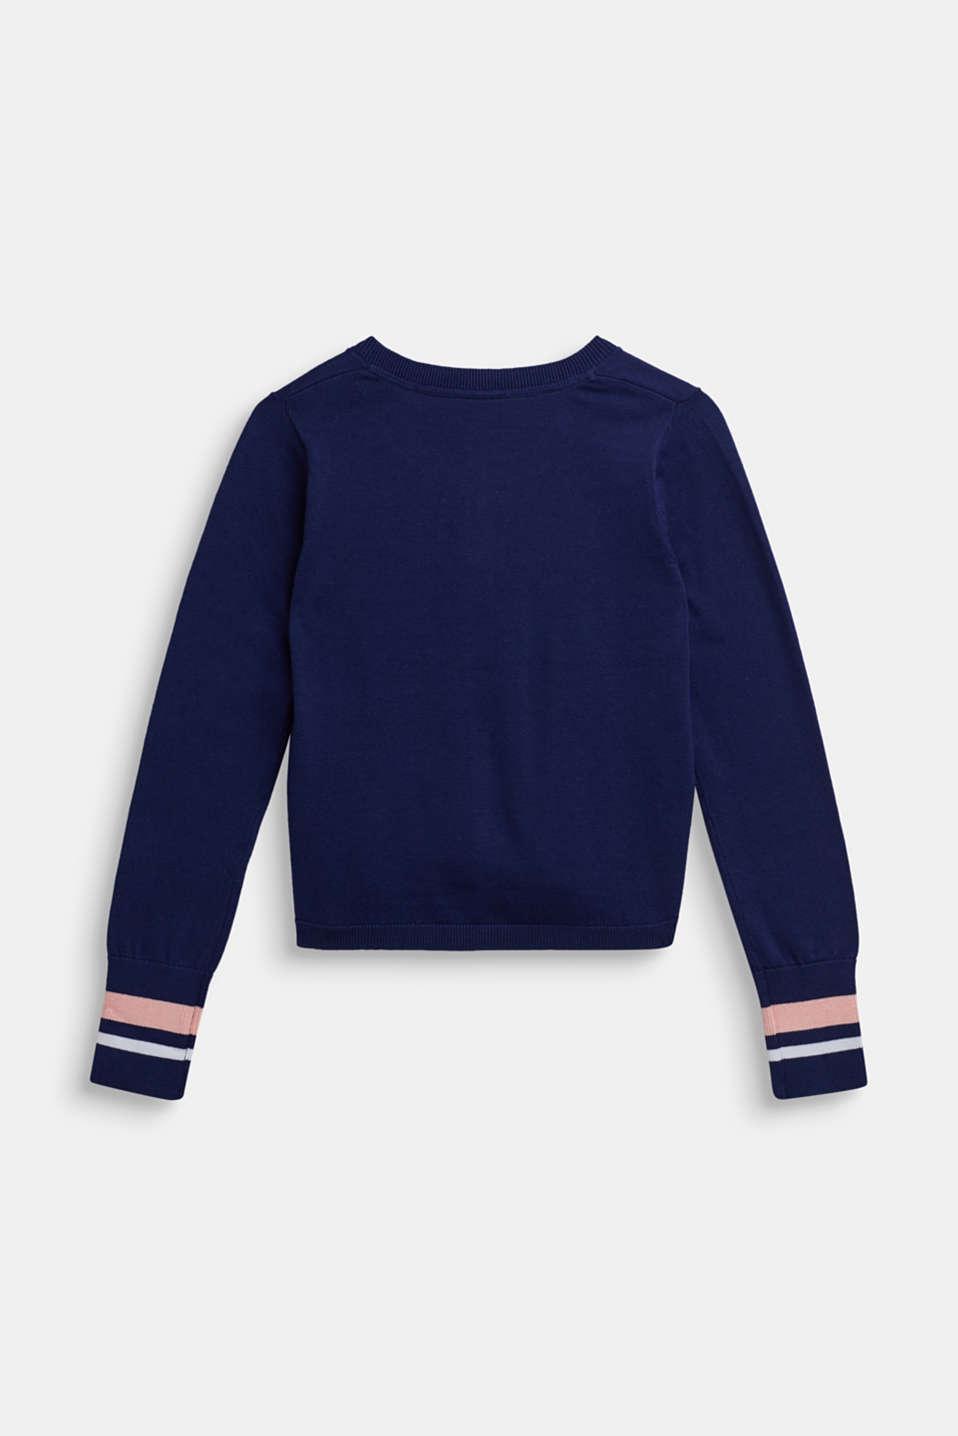 Striped cardigan, 100% cotton, LCMARINE BLUE, detail image number 1